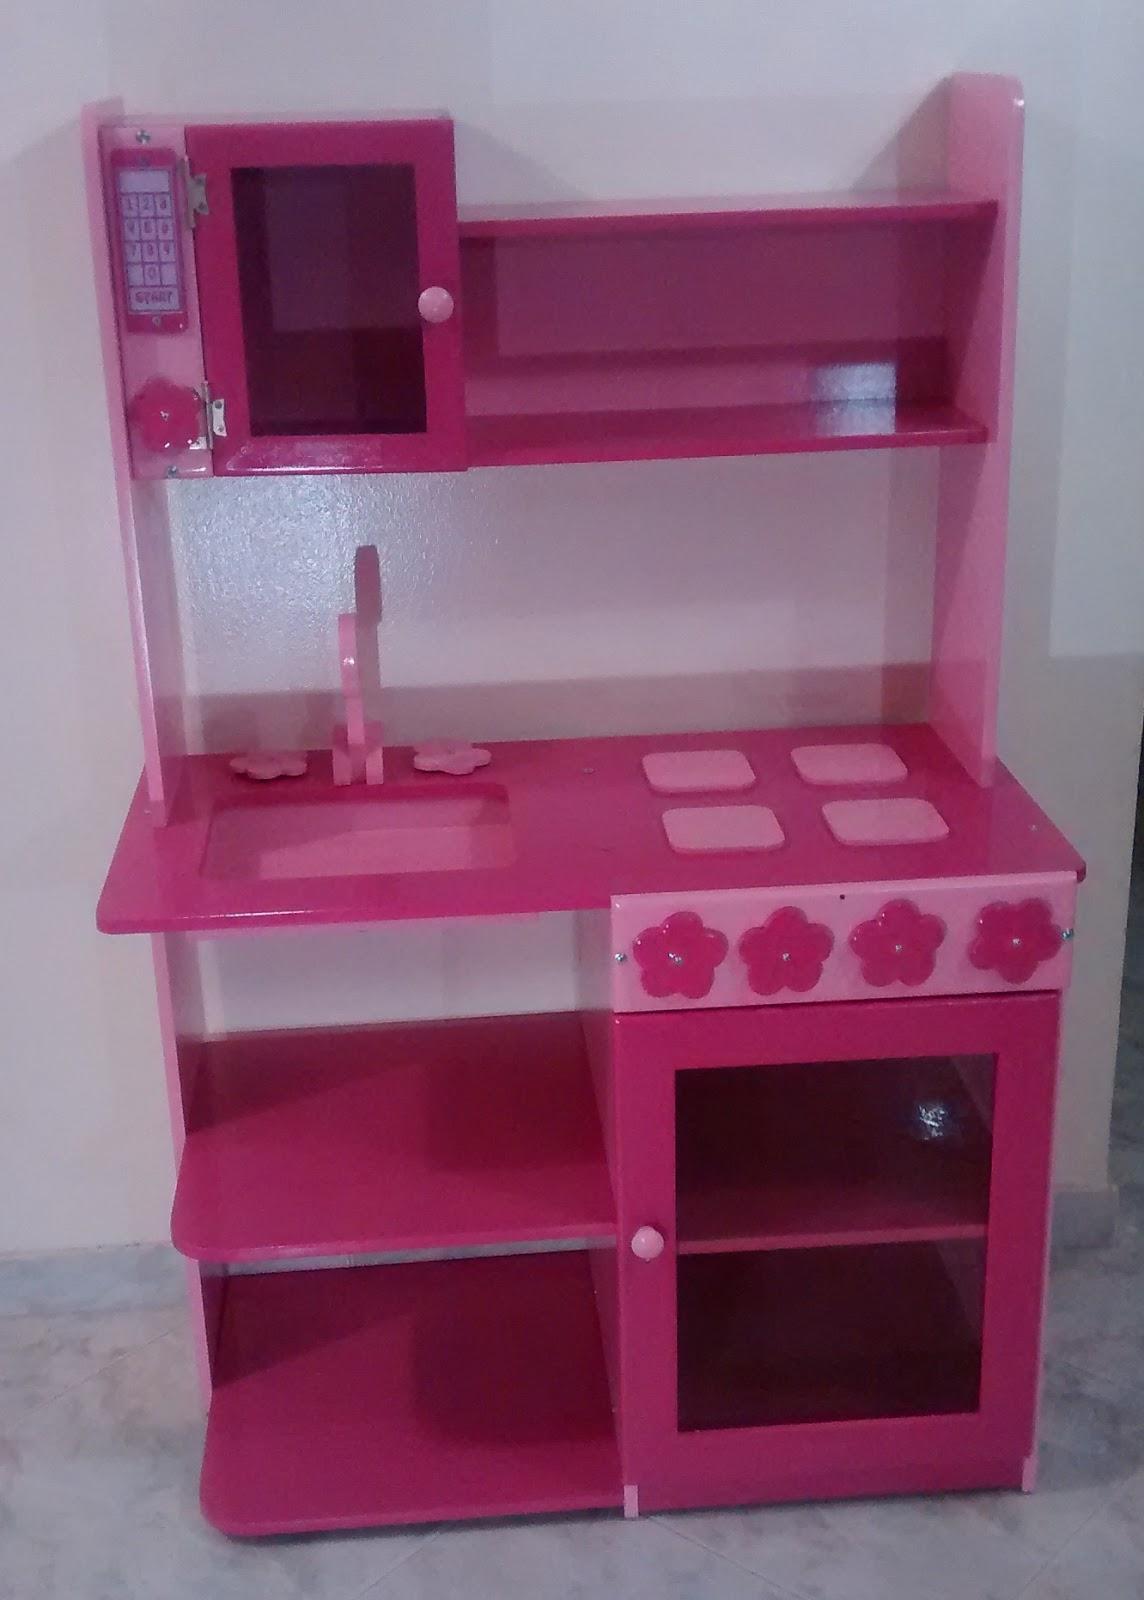 Galeria arte y dise o madekids muebles zona infantil - Armario para juguetes ...